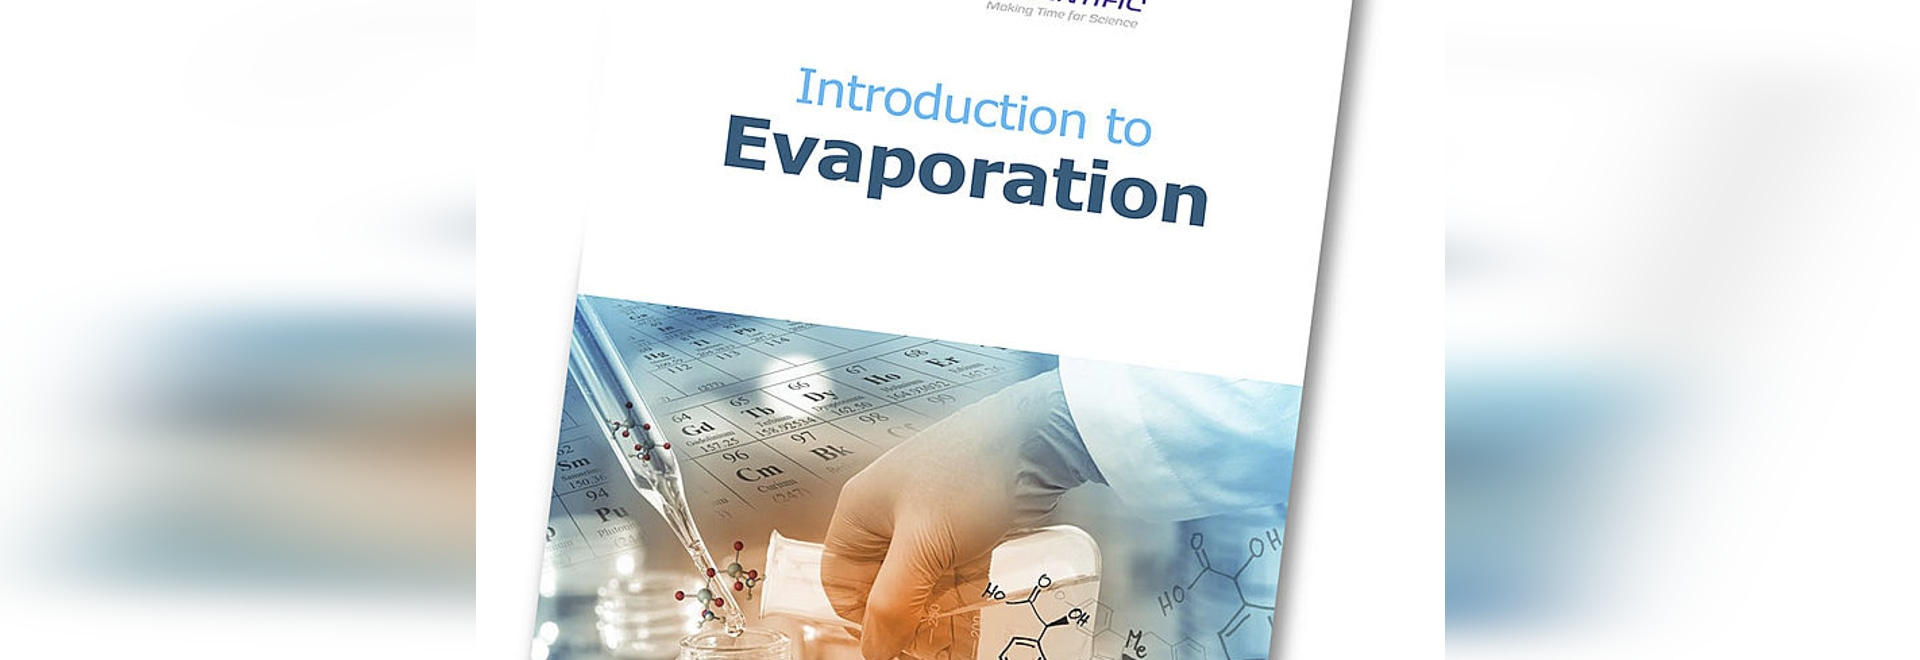 Genevac Introduces Guide to Evaporation